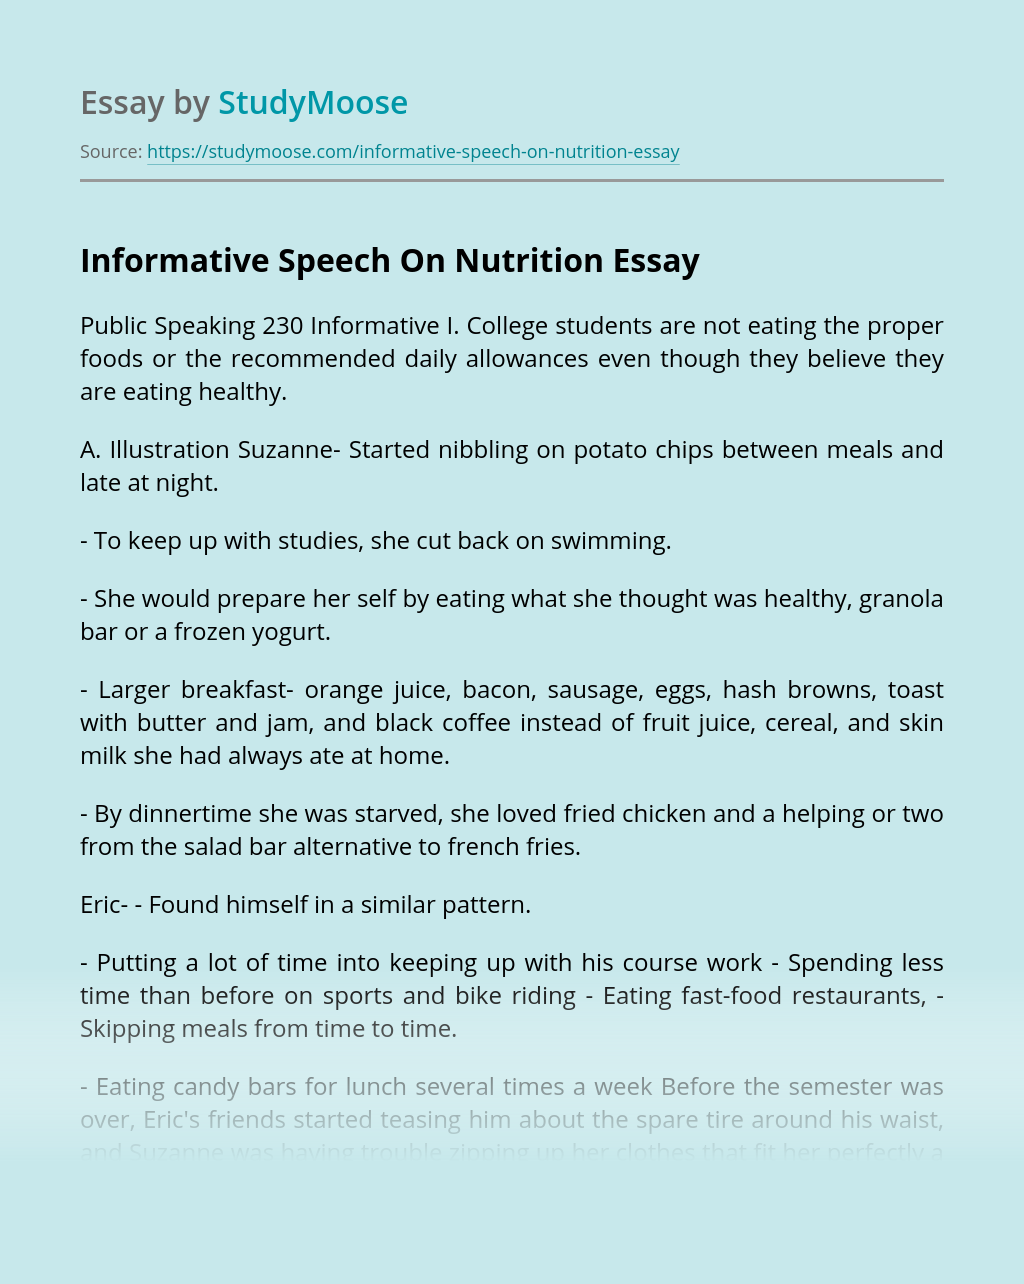 Informative Speech On Nutrition